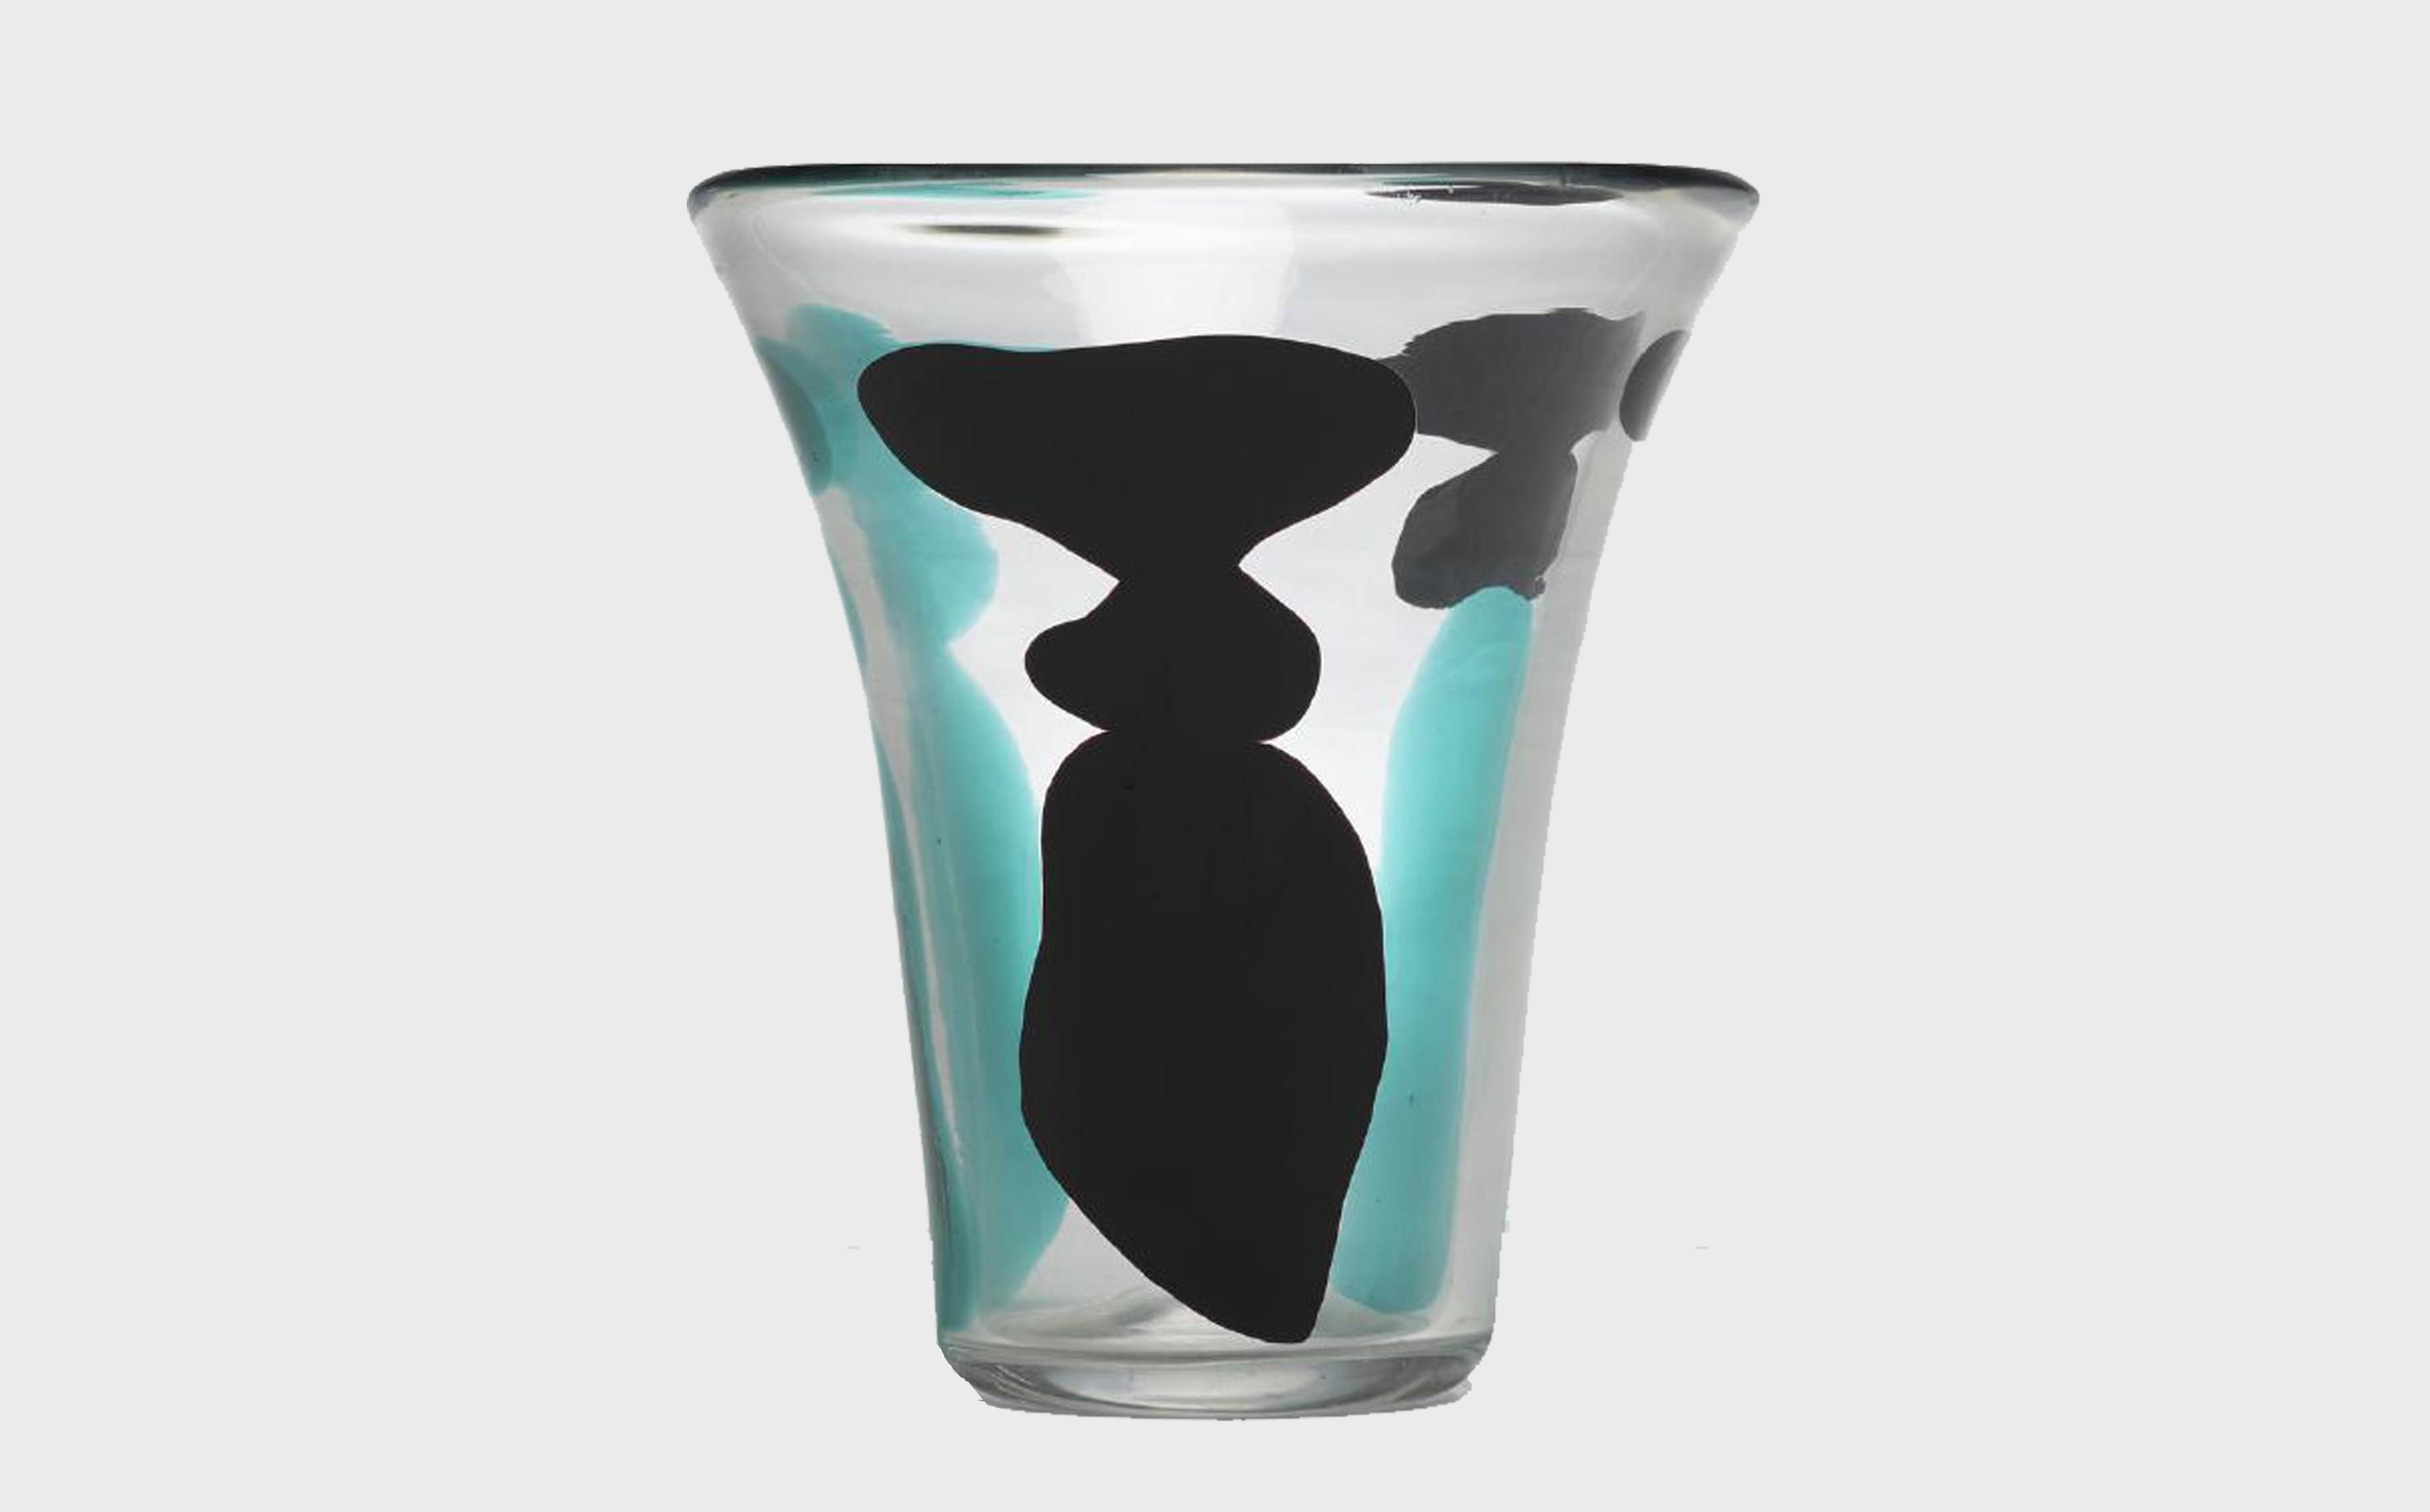 Fulvio Bianconi, Con Macchie vase, model 4325